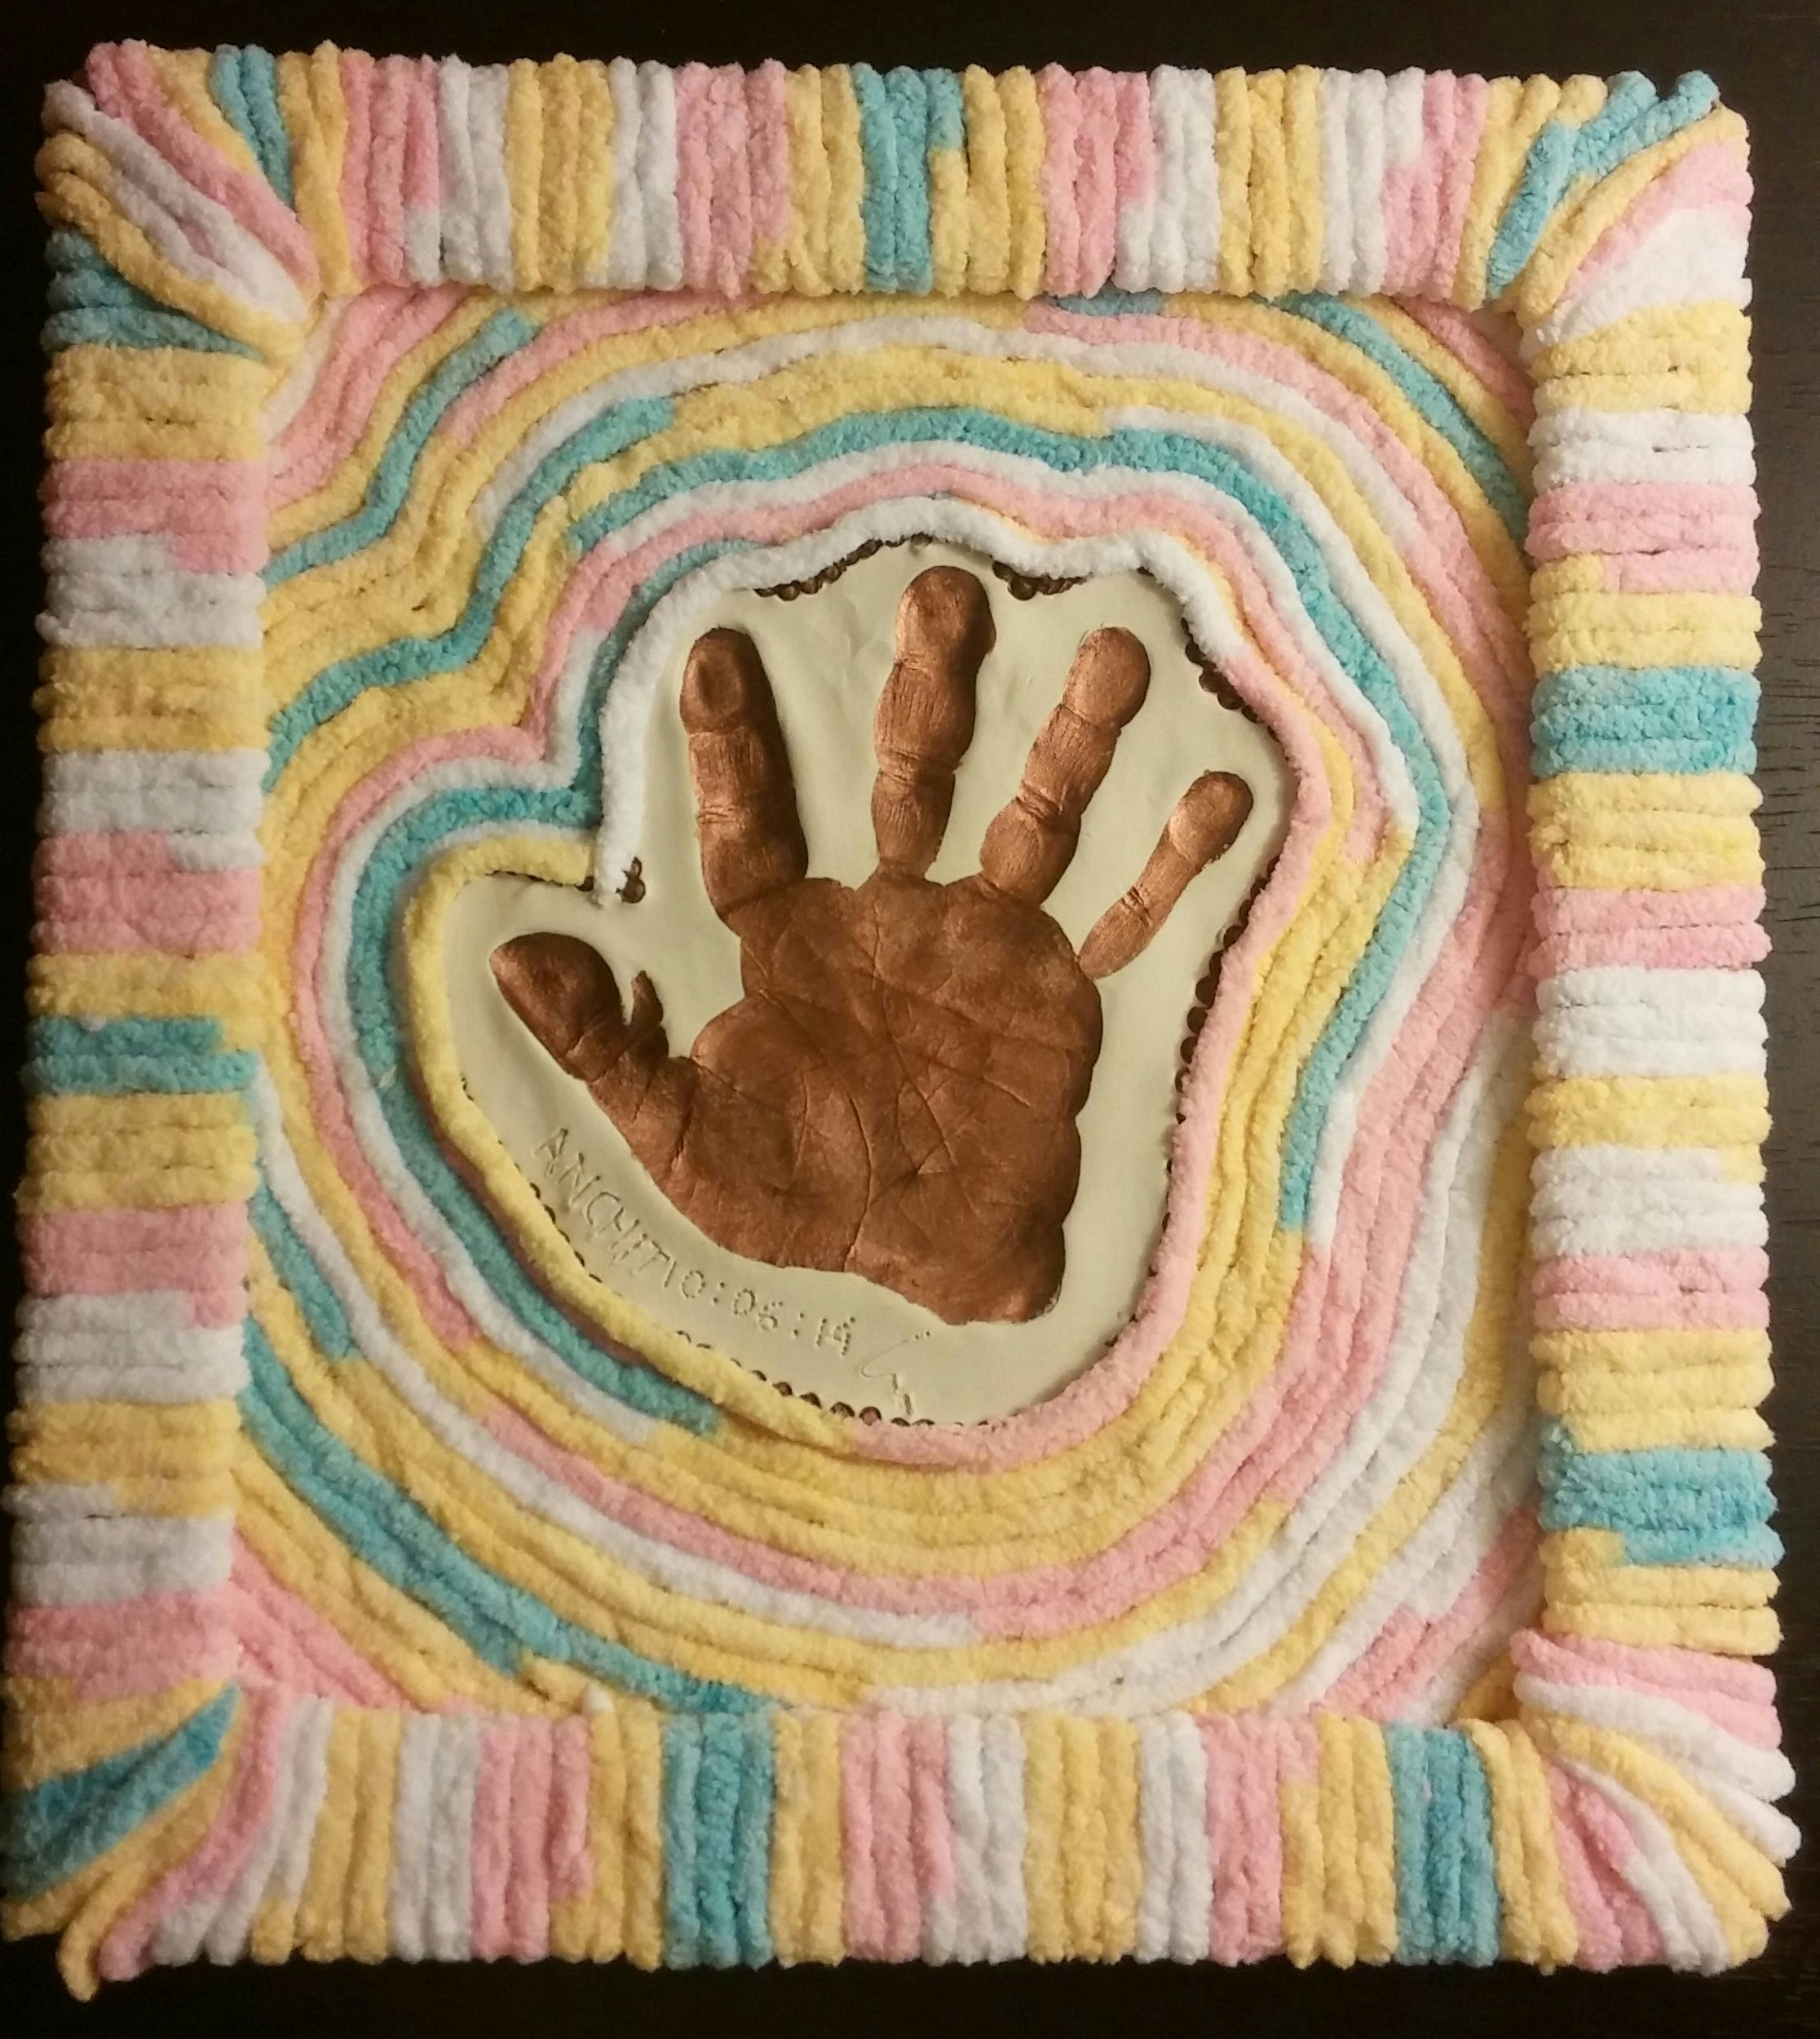 Framed hand-print with yarn and cardboard